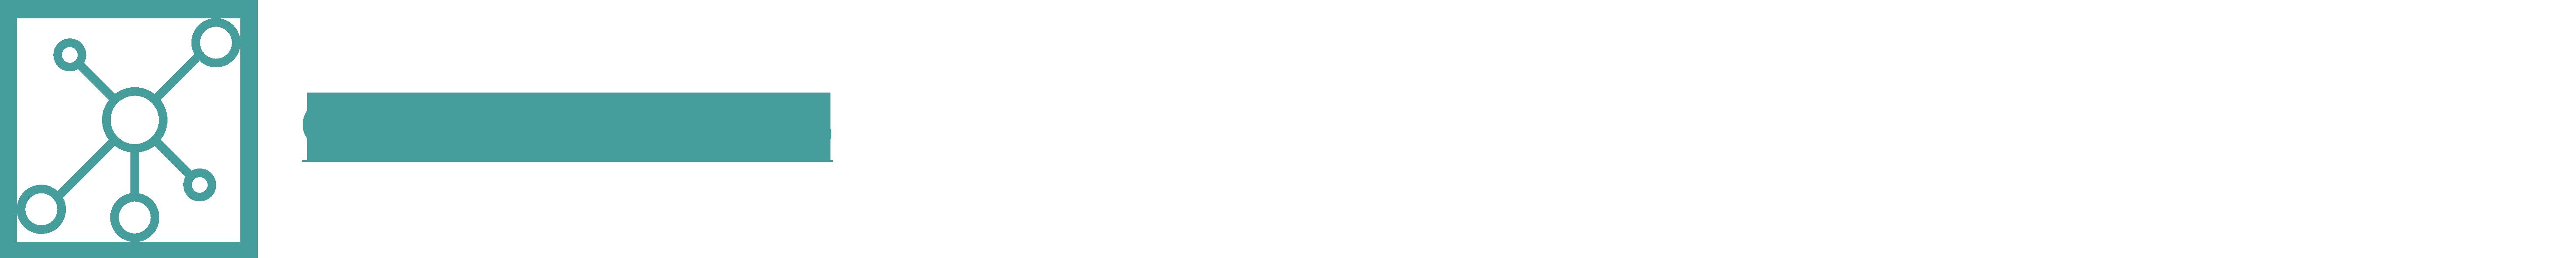 Prix media Décembre 2017